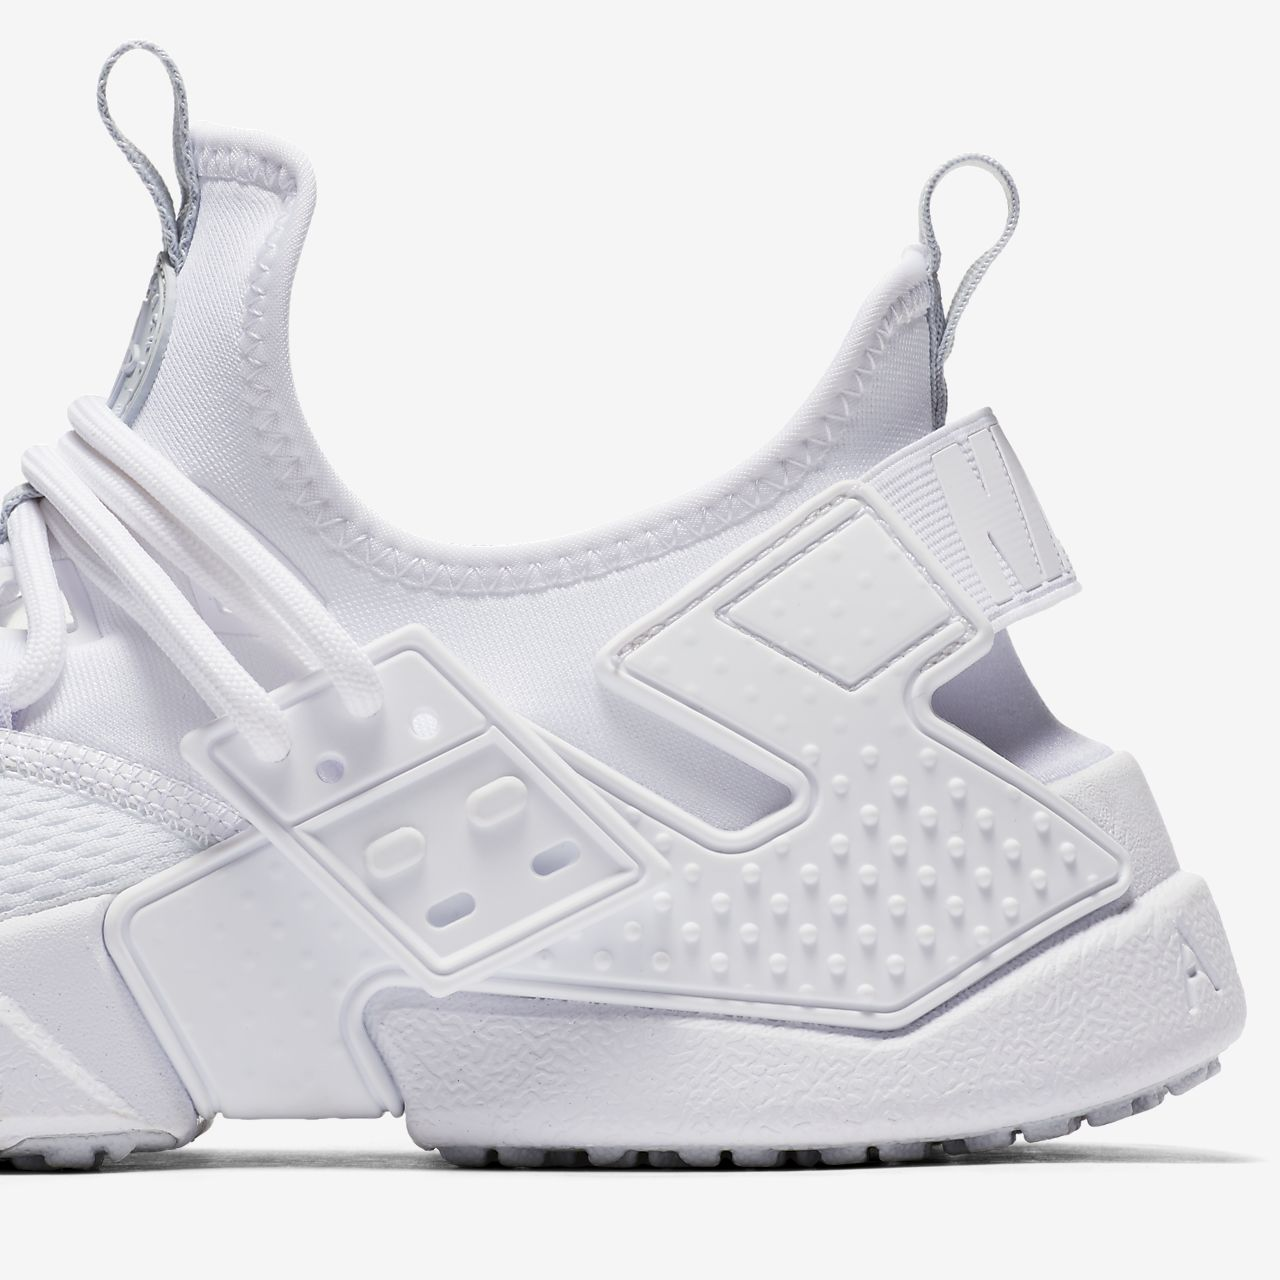 De Italia Nike Air Huarache Drift Breathe White Platinum Comprar Barato Para El Buen Sneakernews De Salida Descuento Colecciones De Venta bjXIO